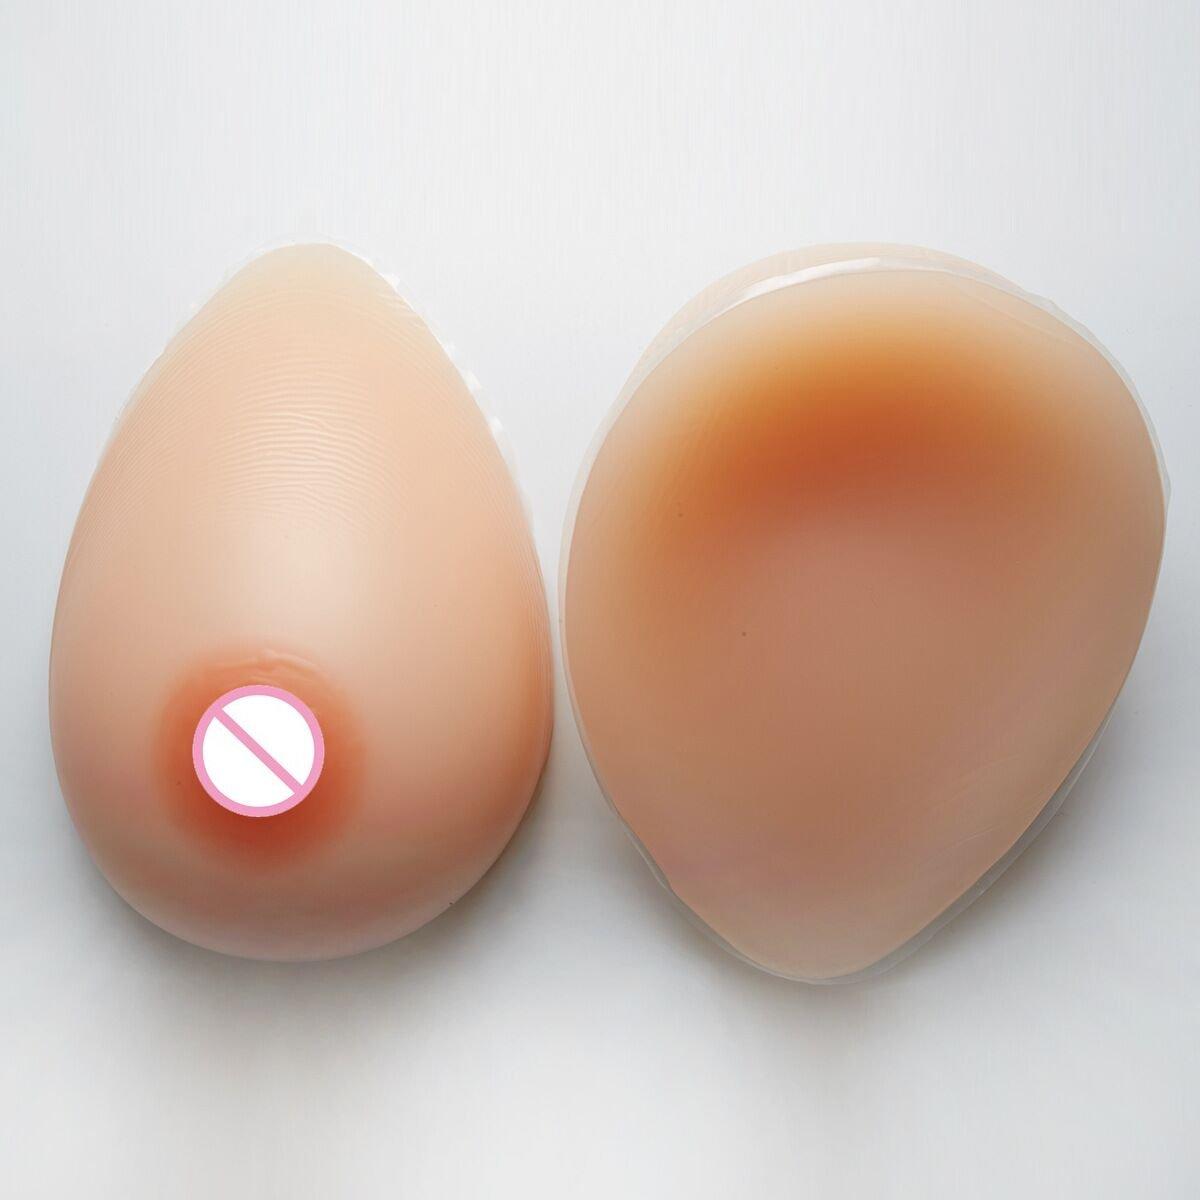 4358444e35006 Amazon.com   1000g pair Breast Forms Silicone Breast Prosthesis Fake Breast  Crosdresser   Baby